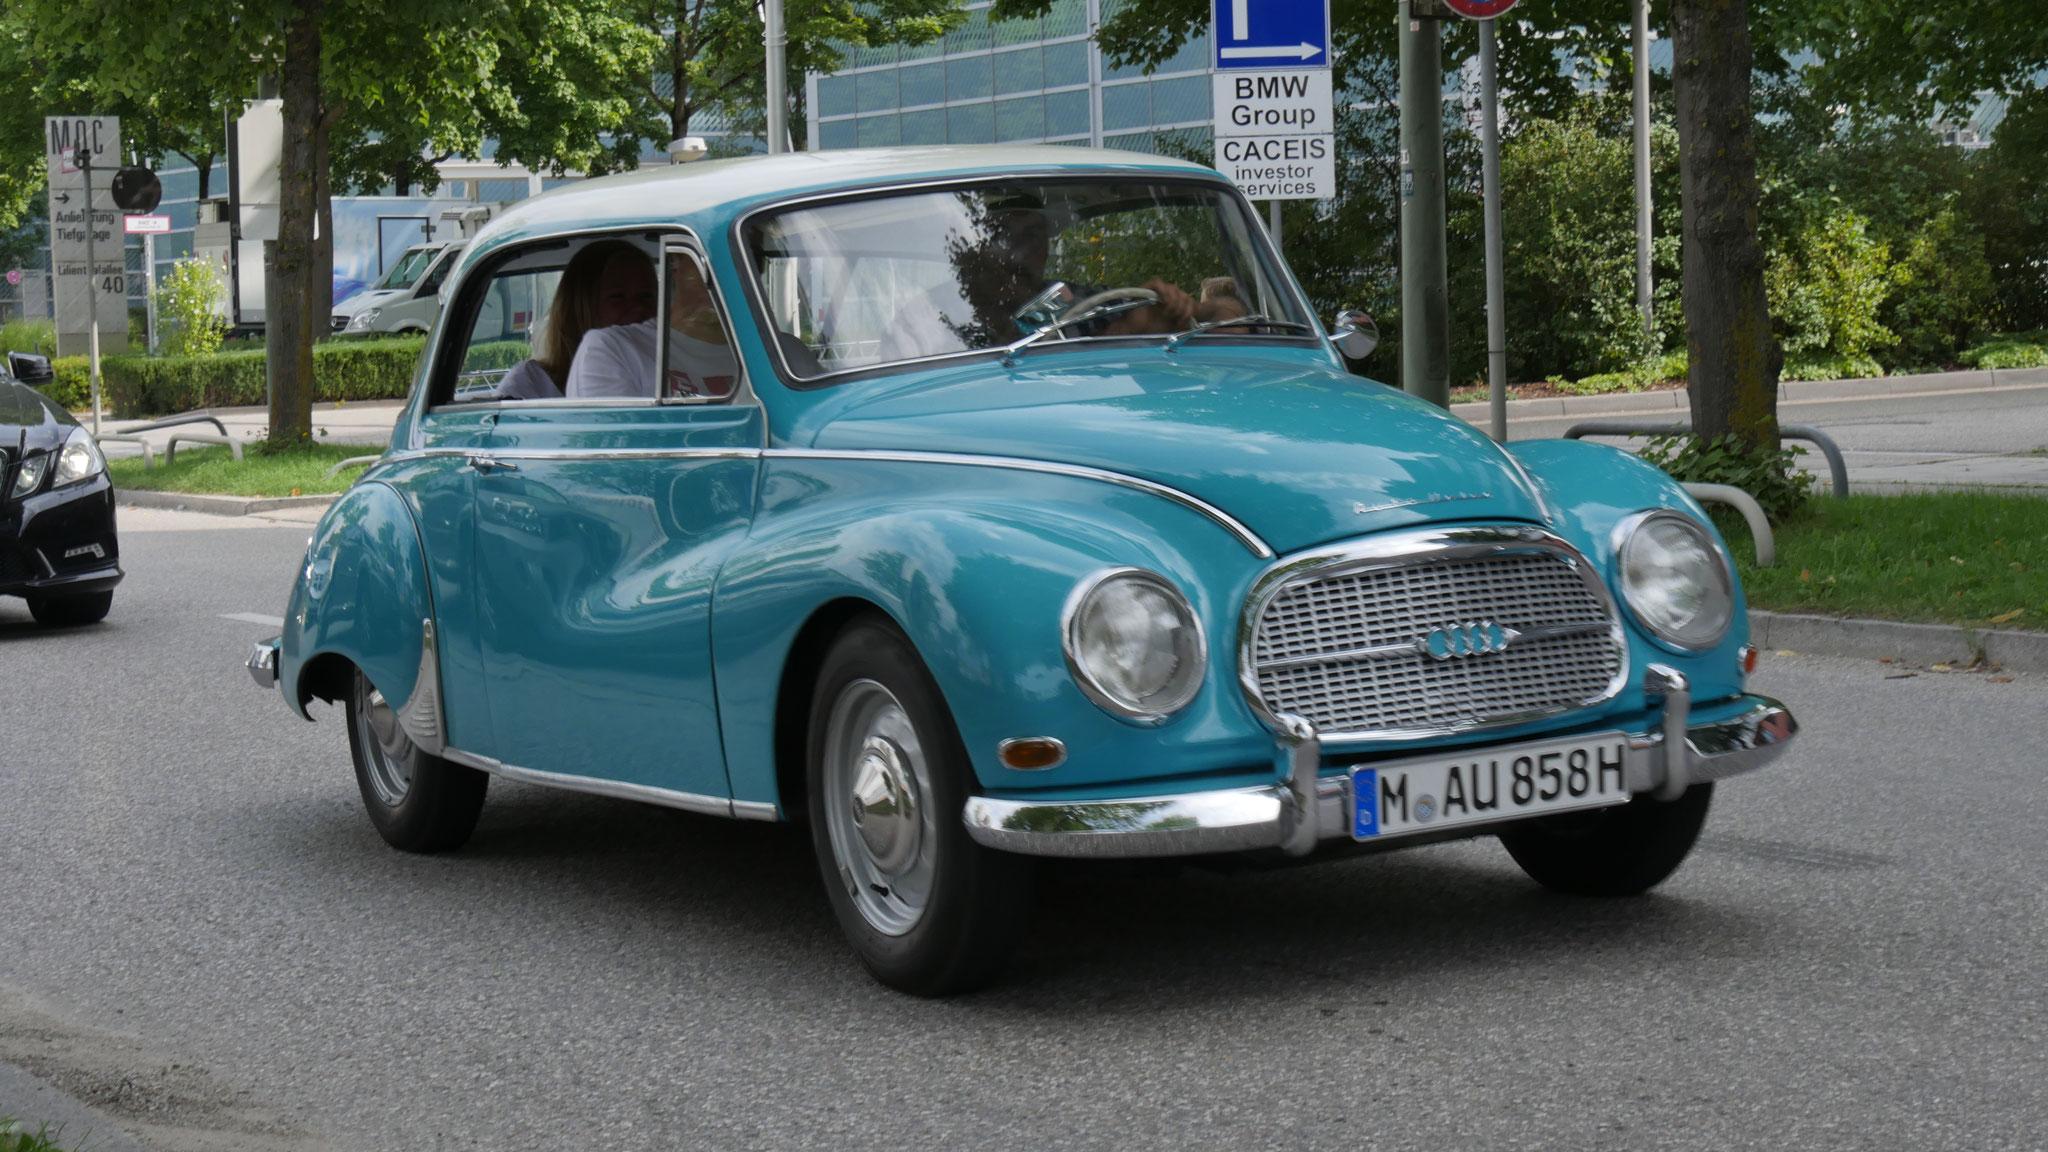 Audi 1000 SaxOmat - M-AU-858H